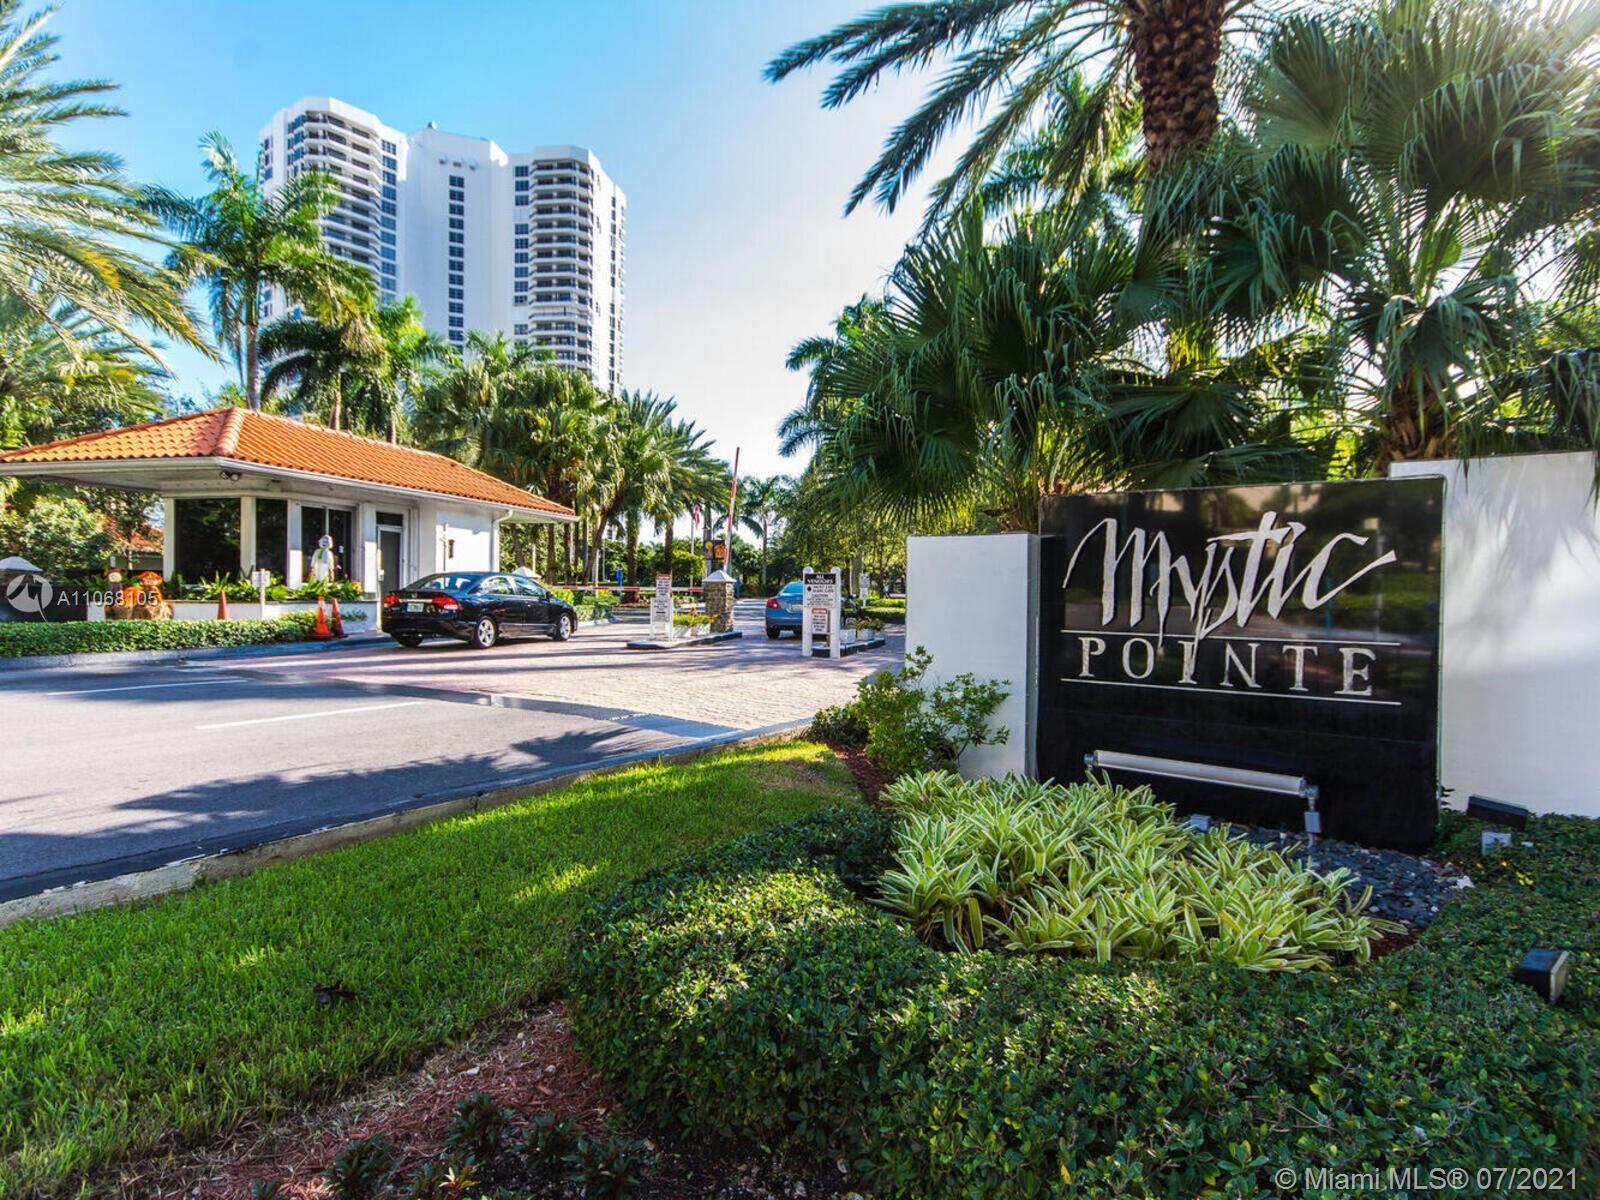 3530 Mystic Pointe Dr #1902, Aventura, FL 33180 - #: A11068105